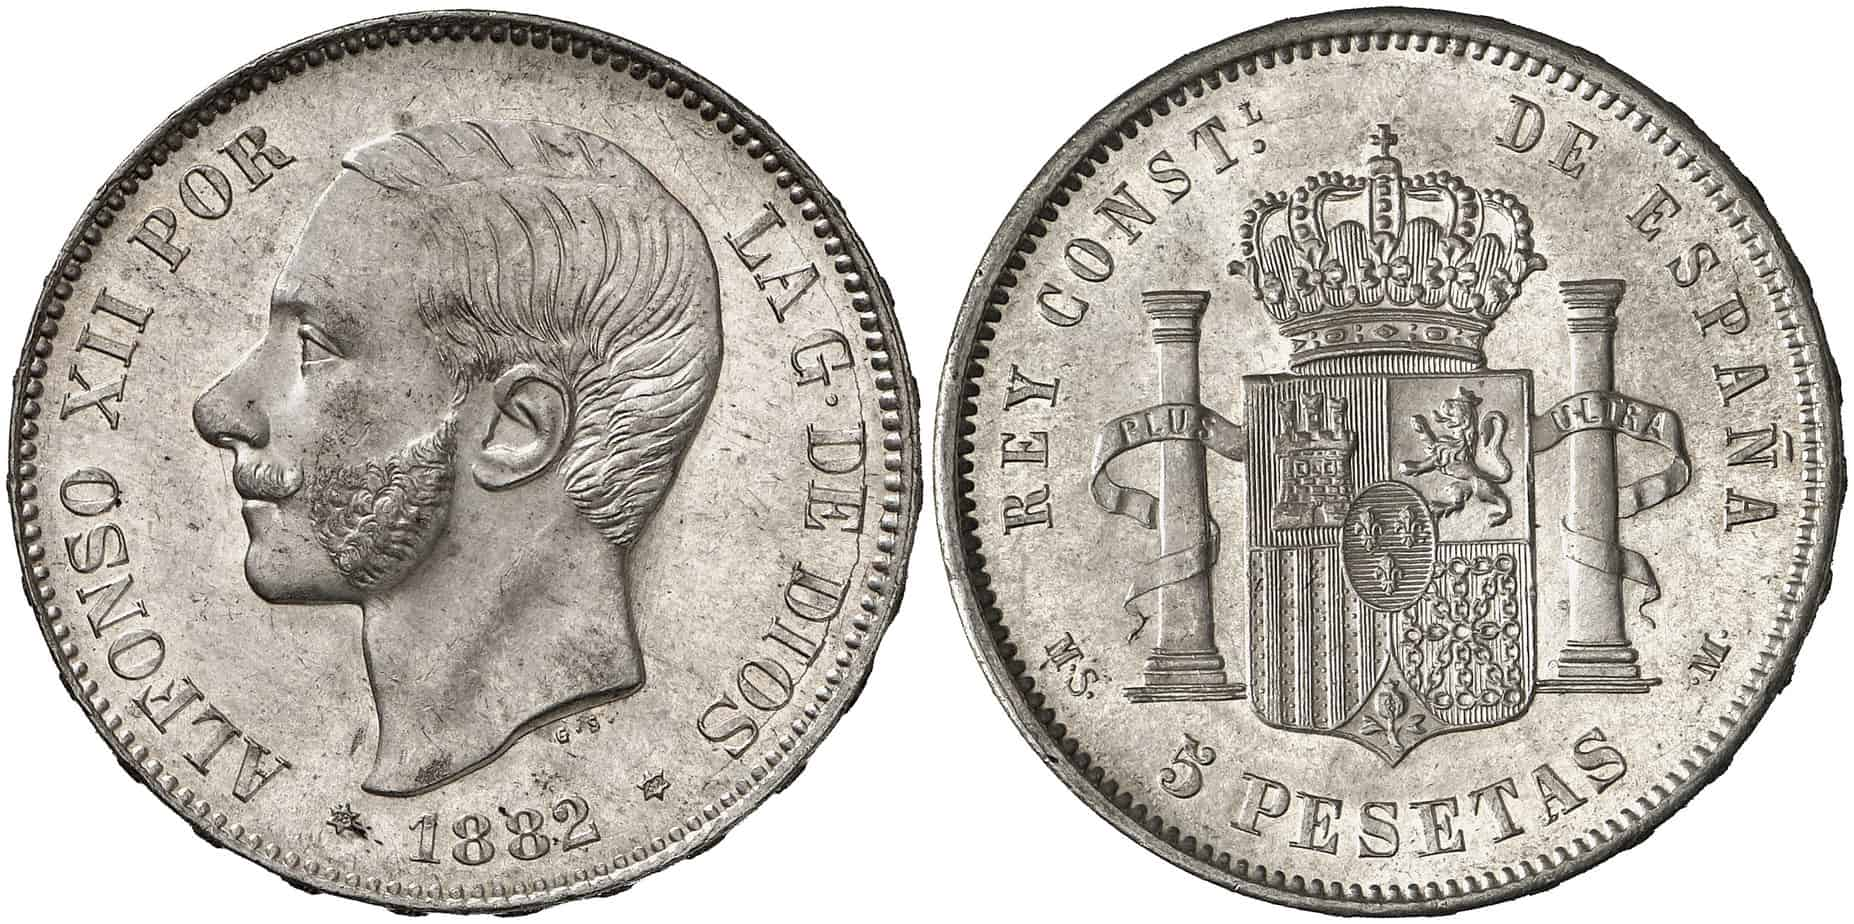 5 pesetas 1882 (18-82) en calidad sin circular